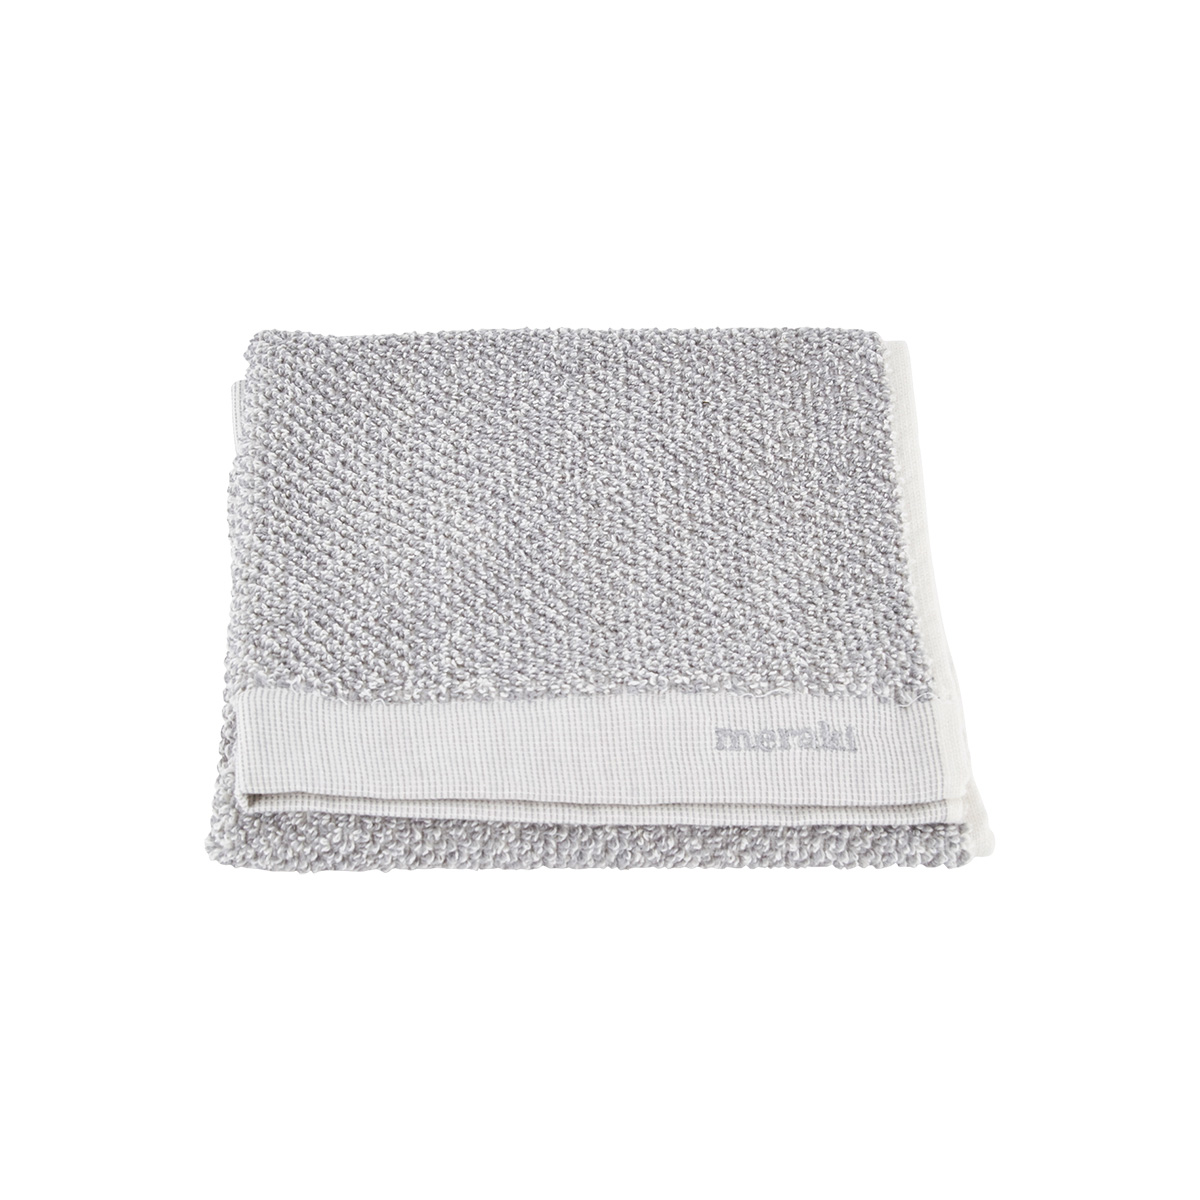 Meraki Håndklæde, hvid/grå, pakke m. 2 stk., 40 x 60 cm, 100% bomuld